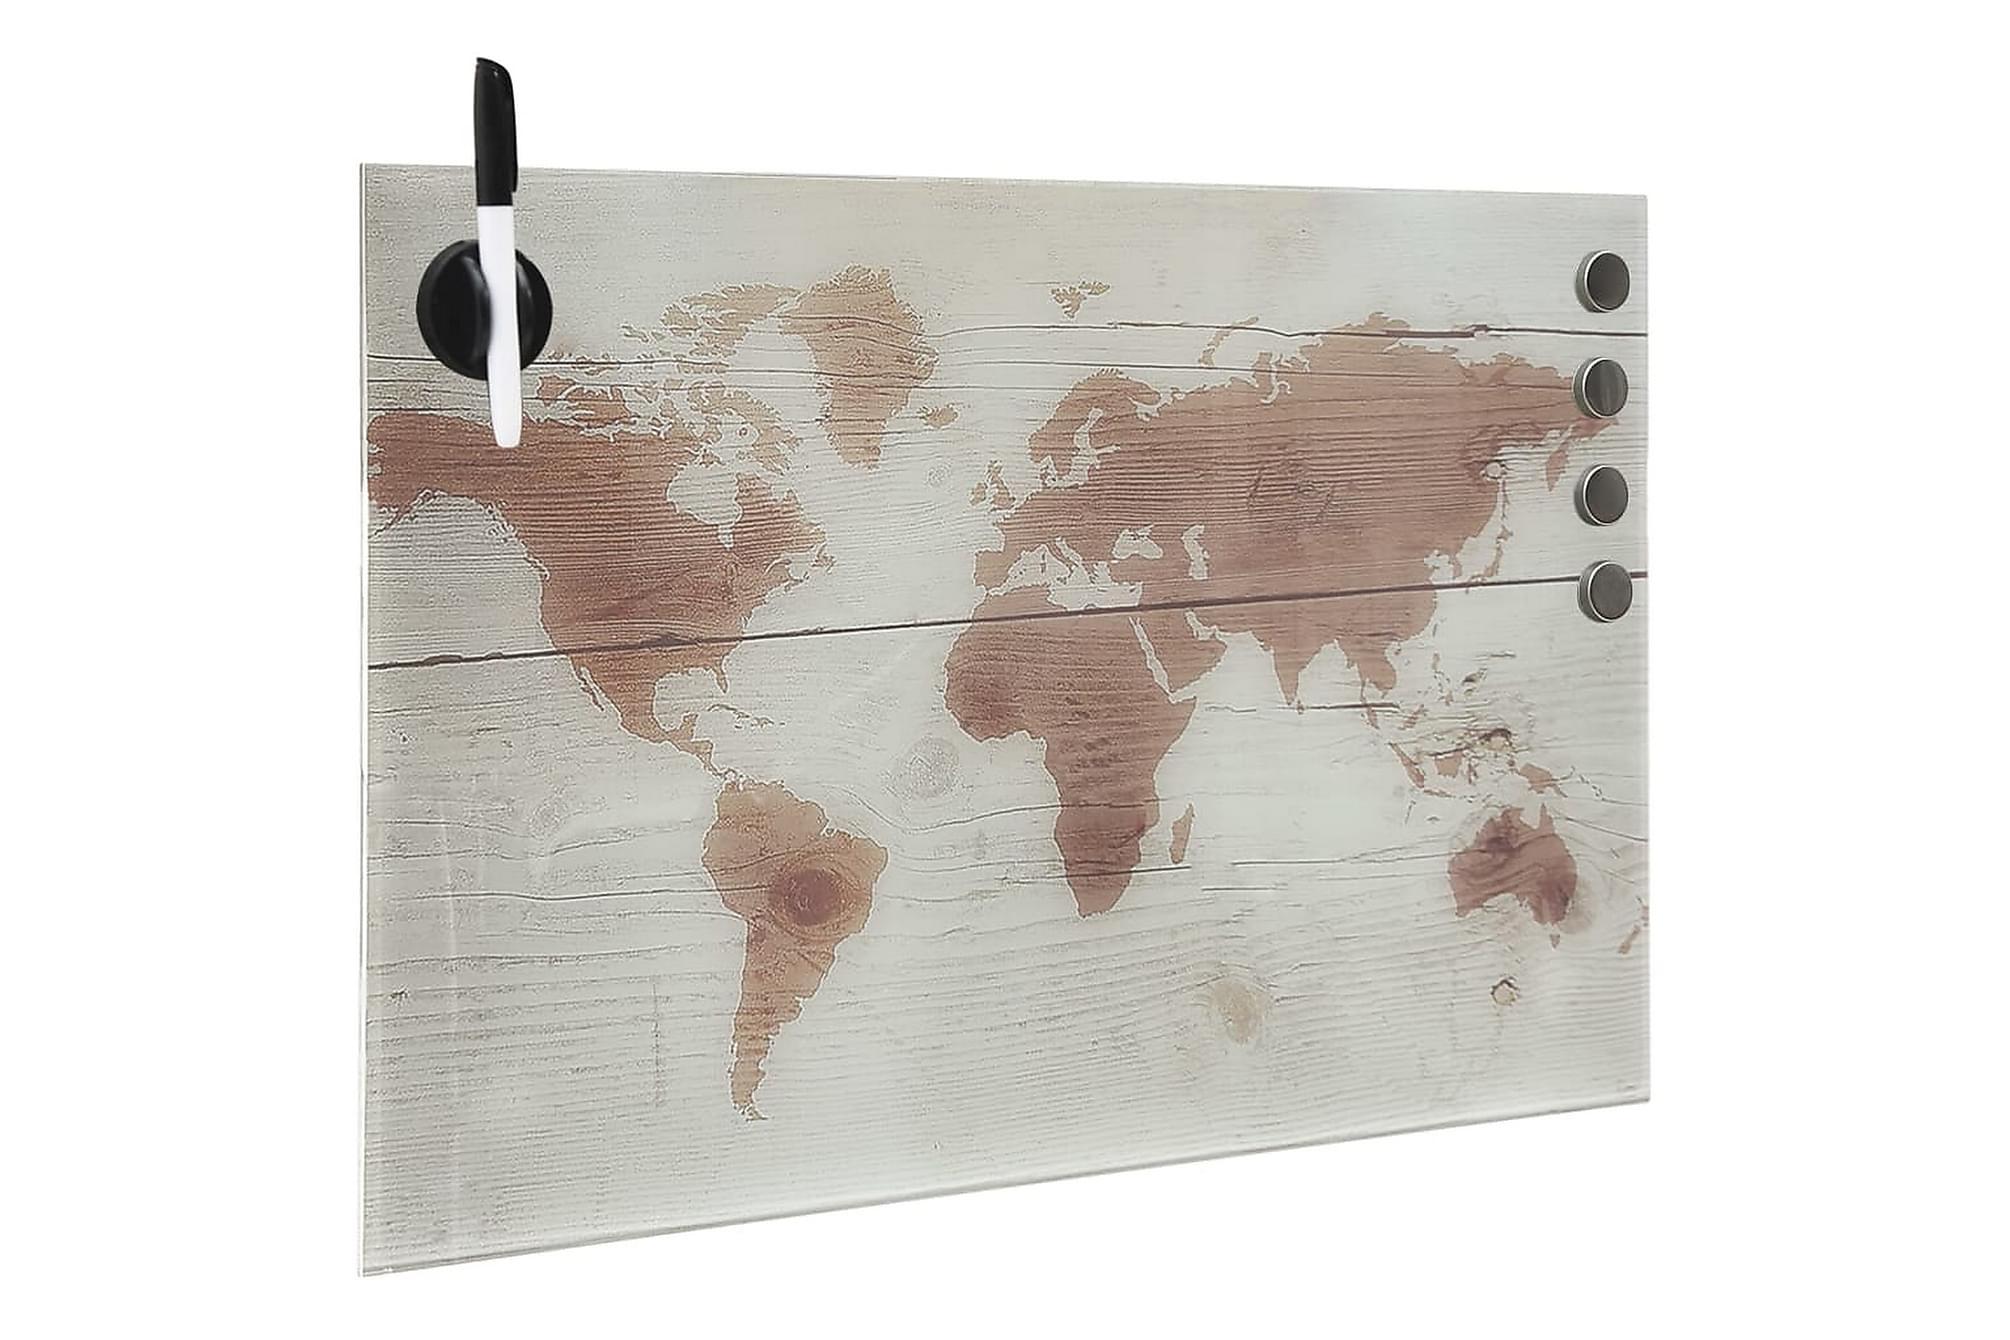 Magnetisk glastavla väggmonterad 60x40 cm, Whiteboards & griffeltavlor